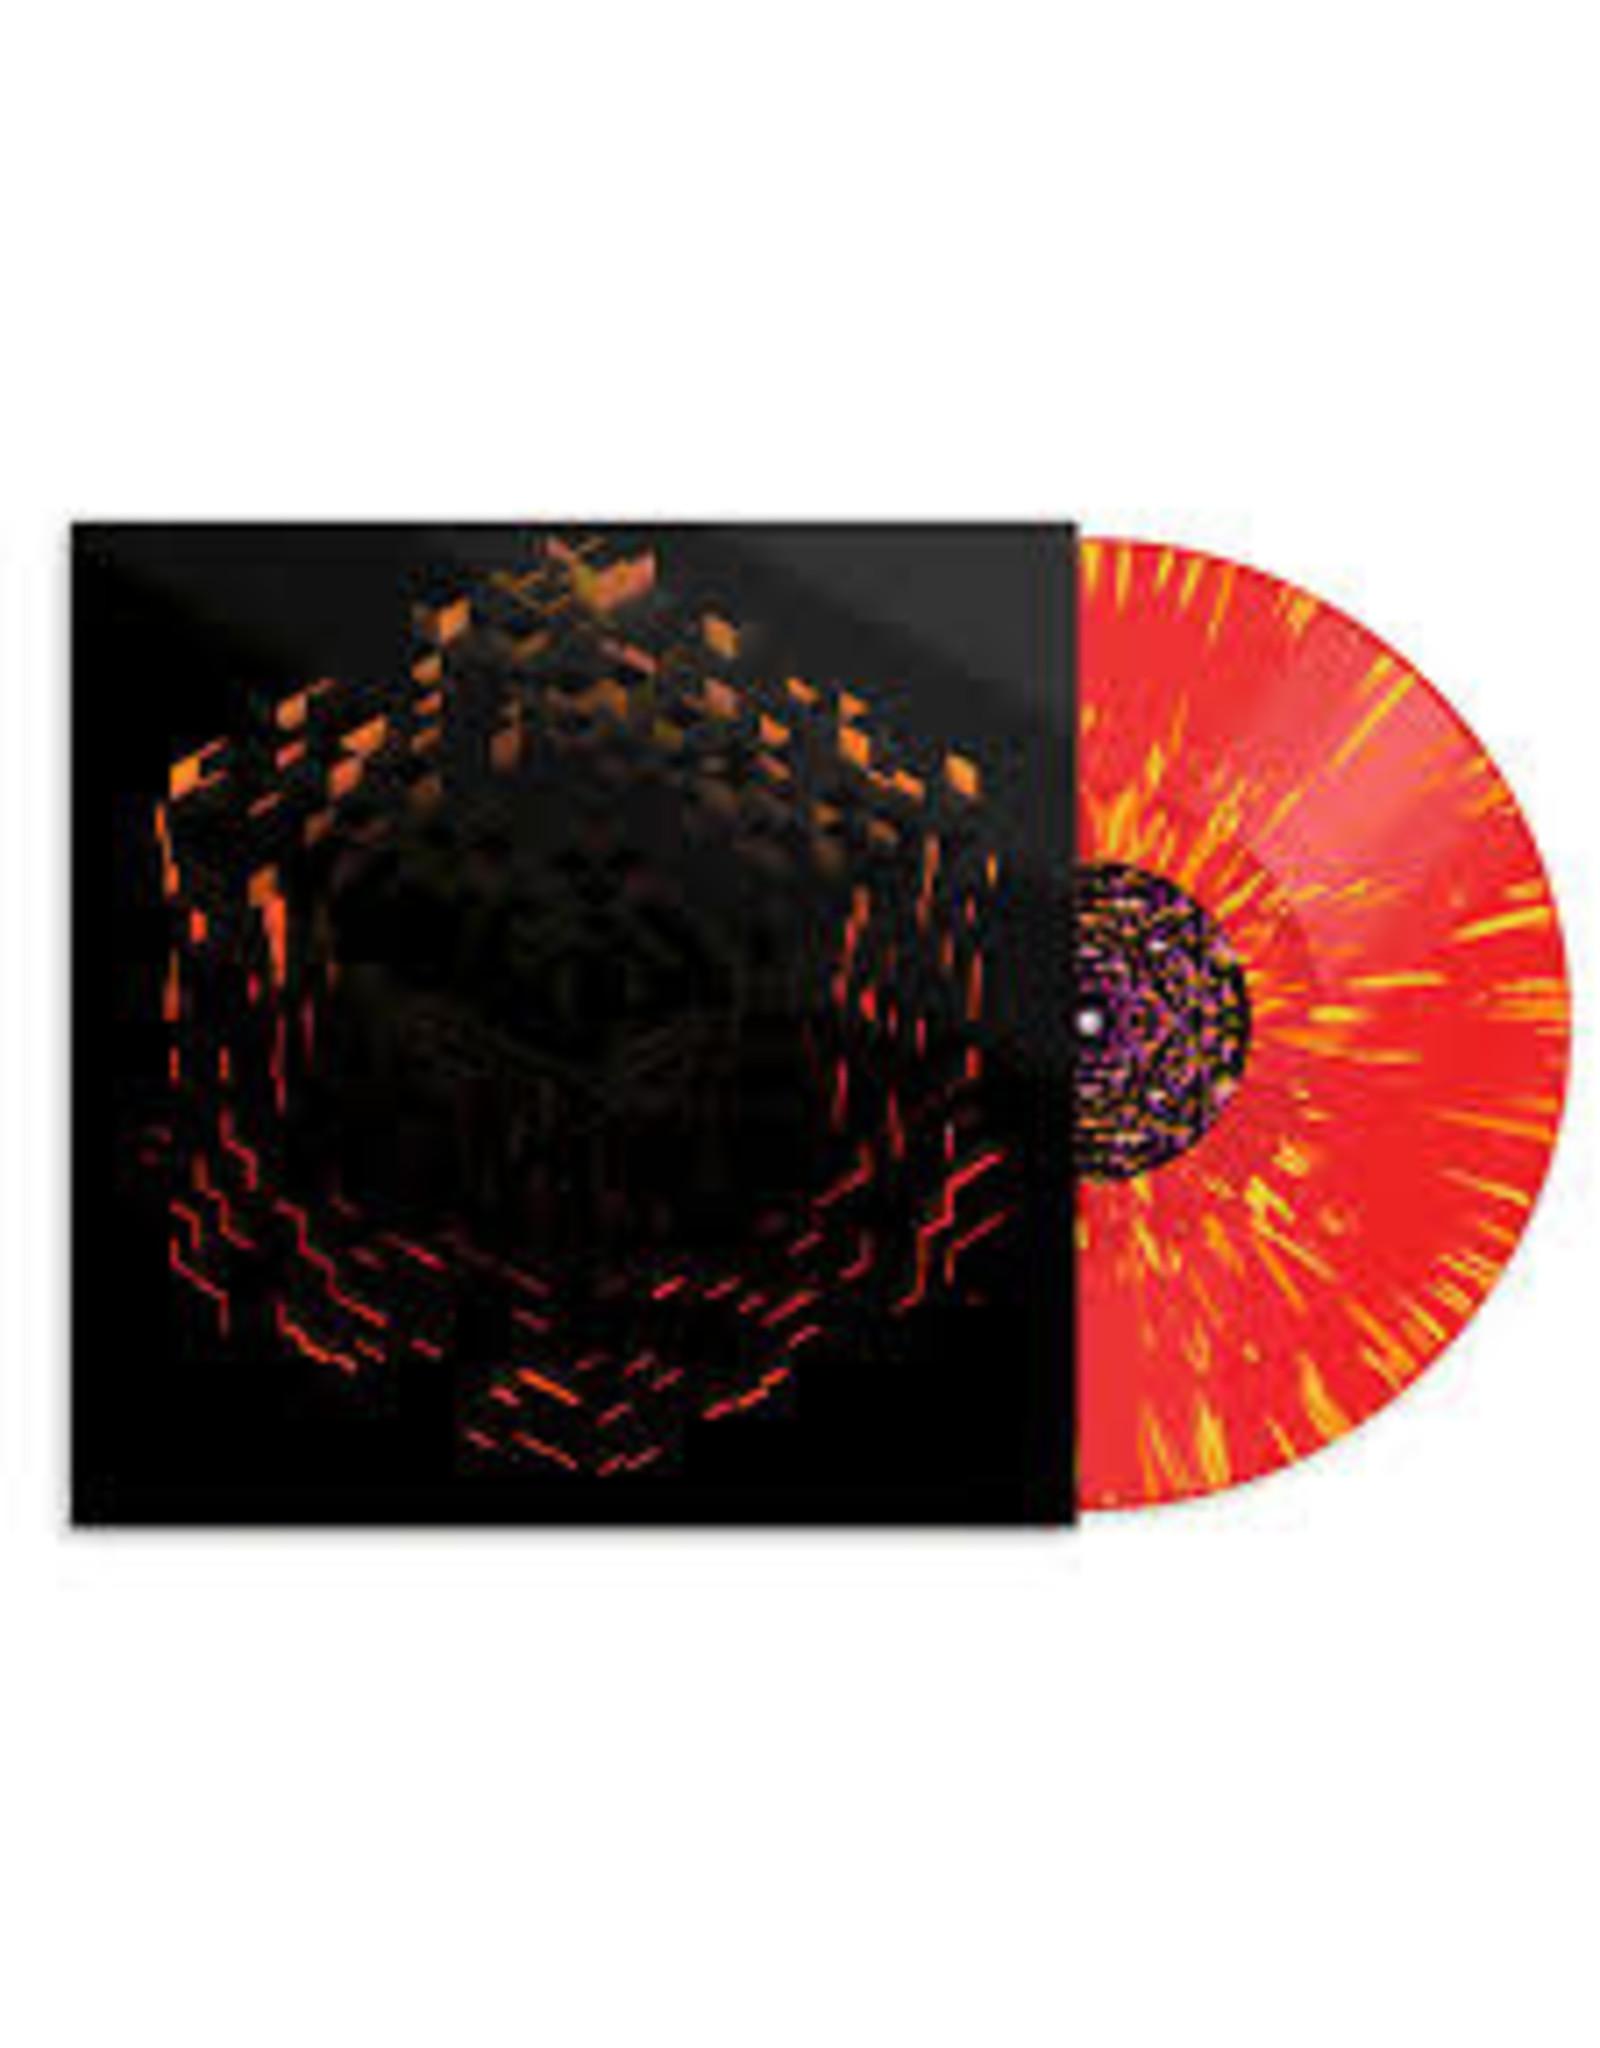 OST - Minecraft Volume Beta (Fire Splatter) LP